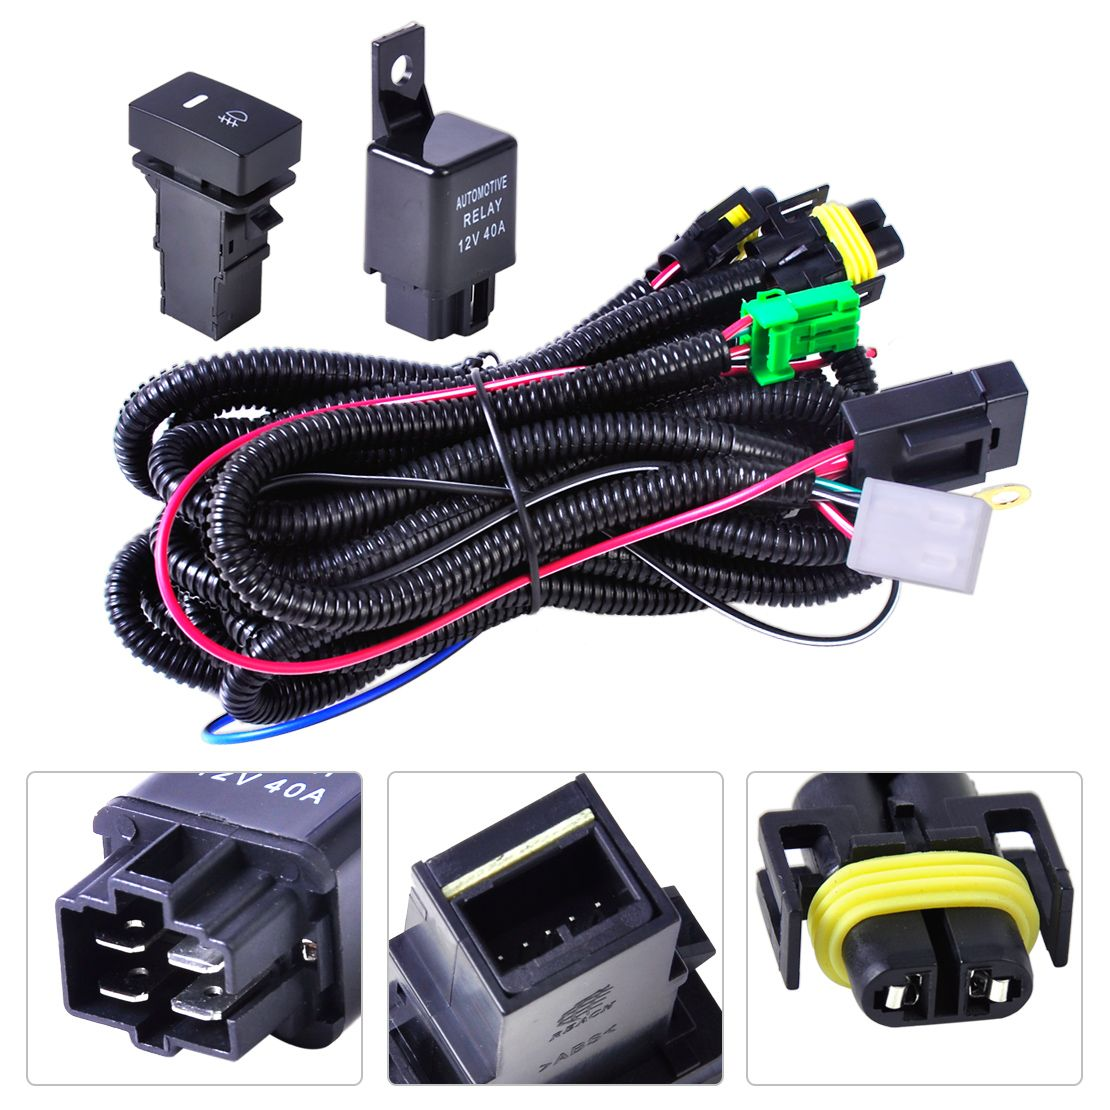 Dwcx Жгуты проводки розетки Провода + переключатель для H11 Туман лампа для Ford Focus 2008-2014 Acura TSX 11 -14 Nissan Cube 2009-2015